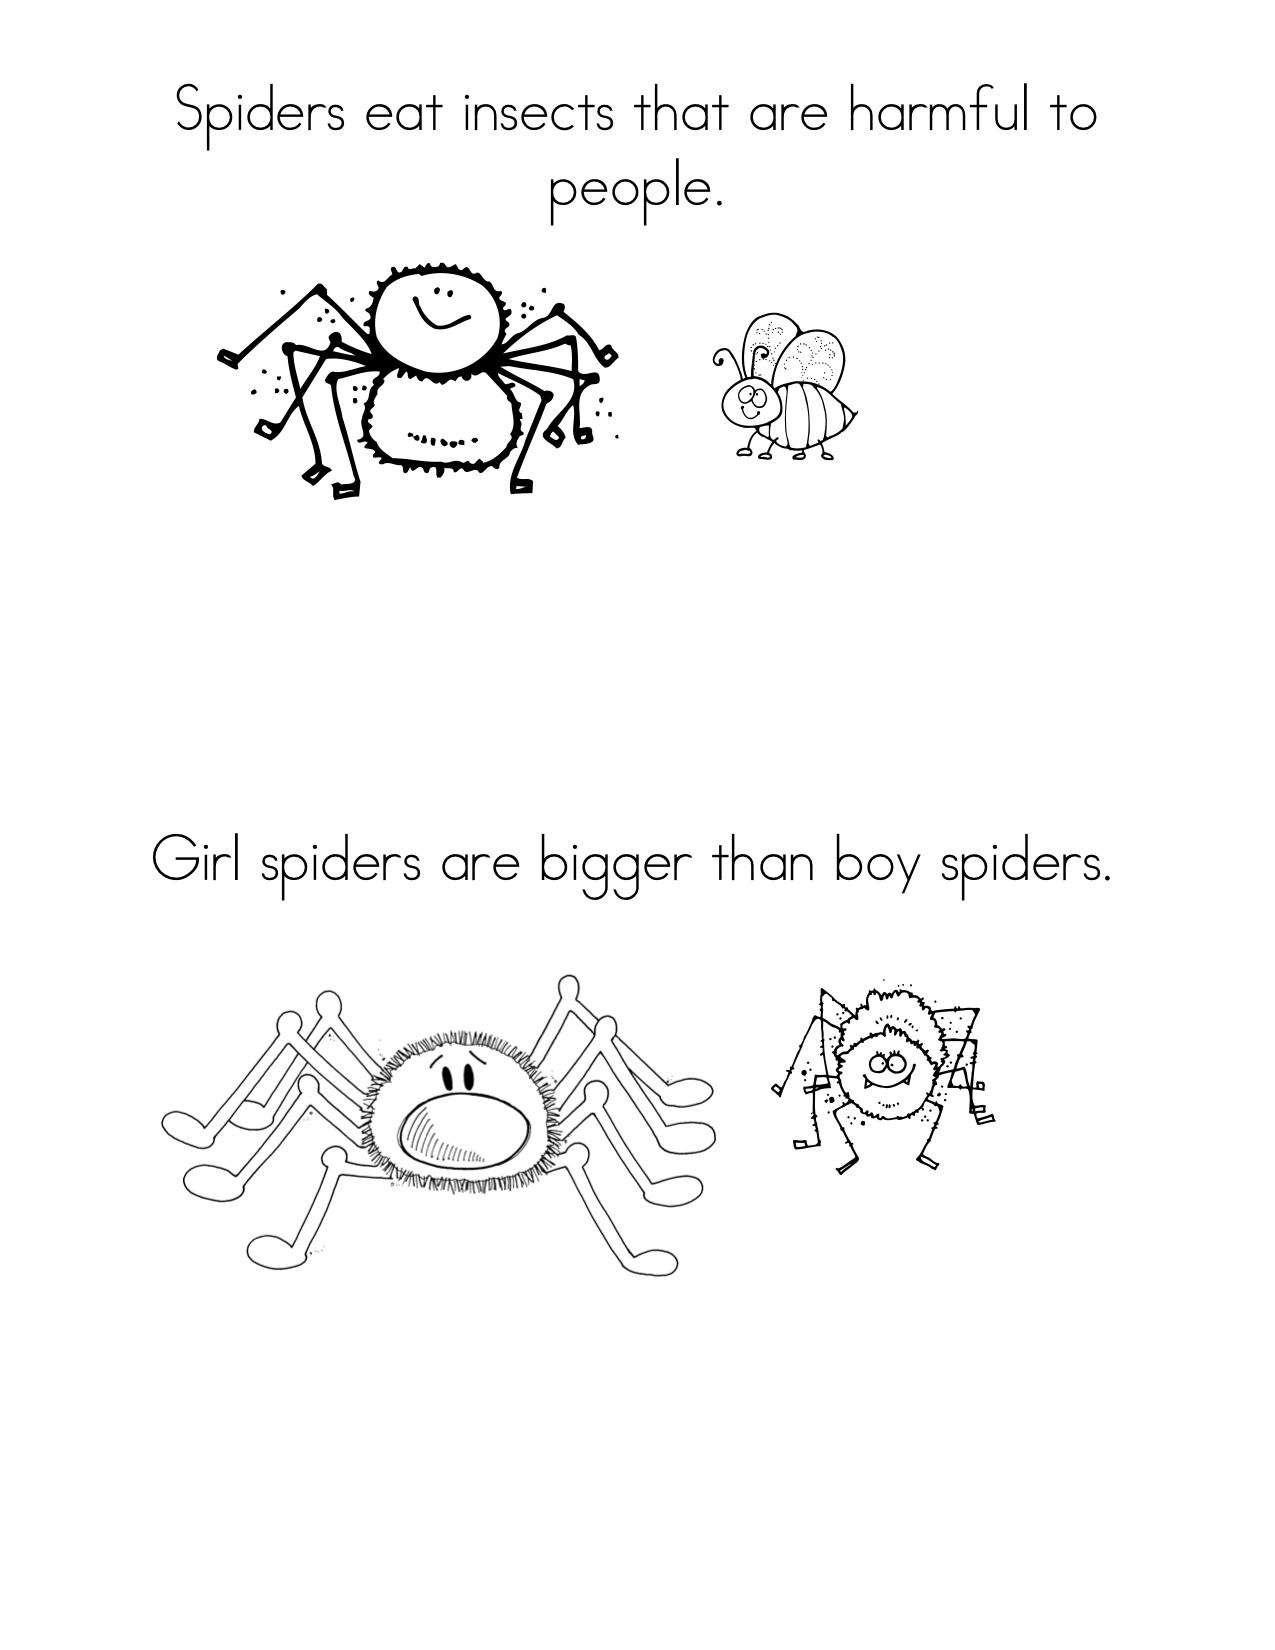 Spider Facts 1